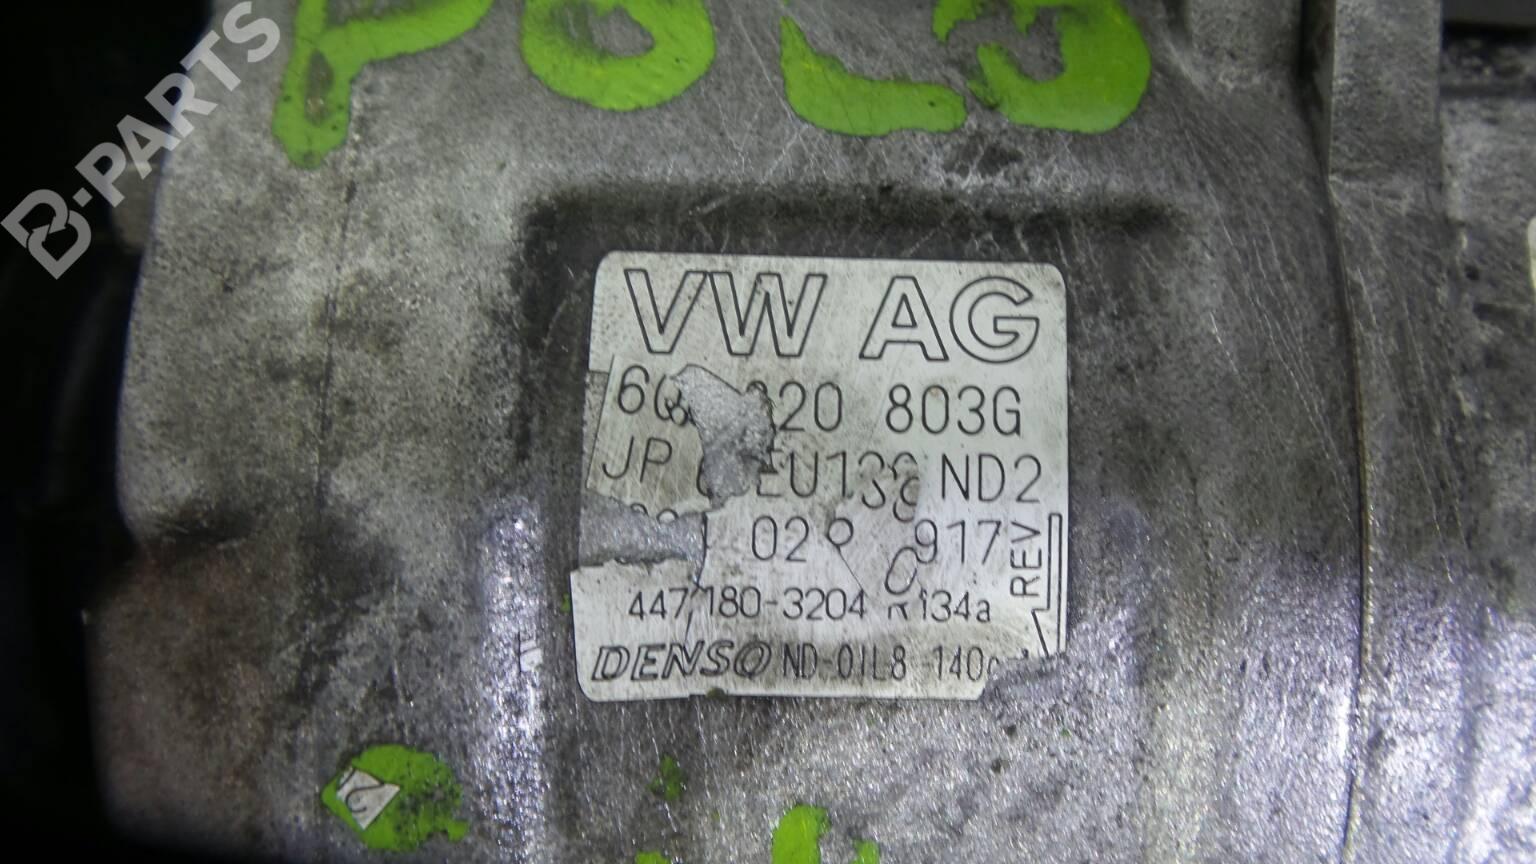 Ac Compressor Vw Polo 9n 14 16v 143742 Kompresor Denso 6q0820803g 447180 3204 16v5